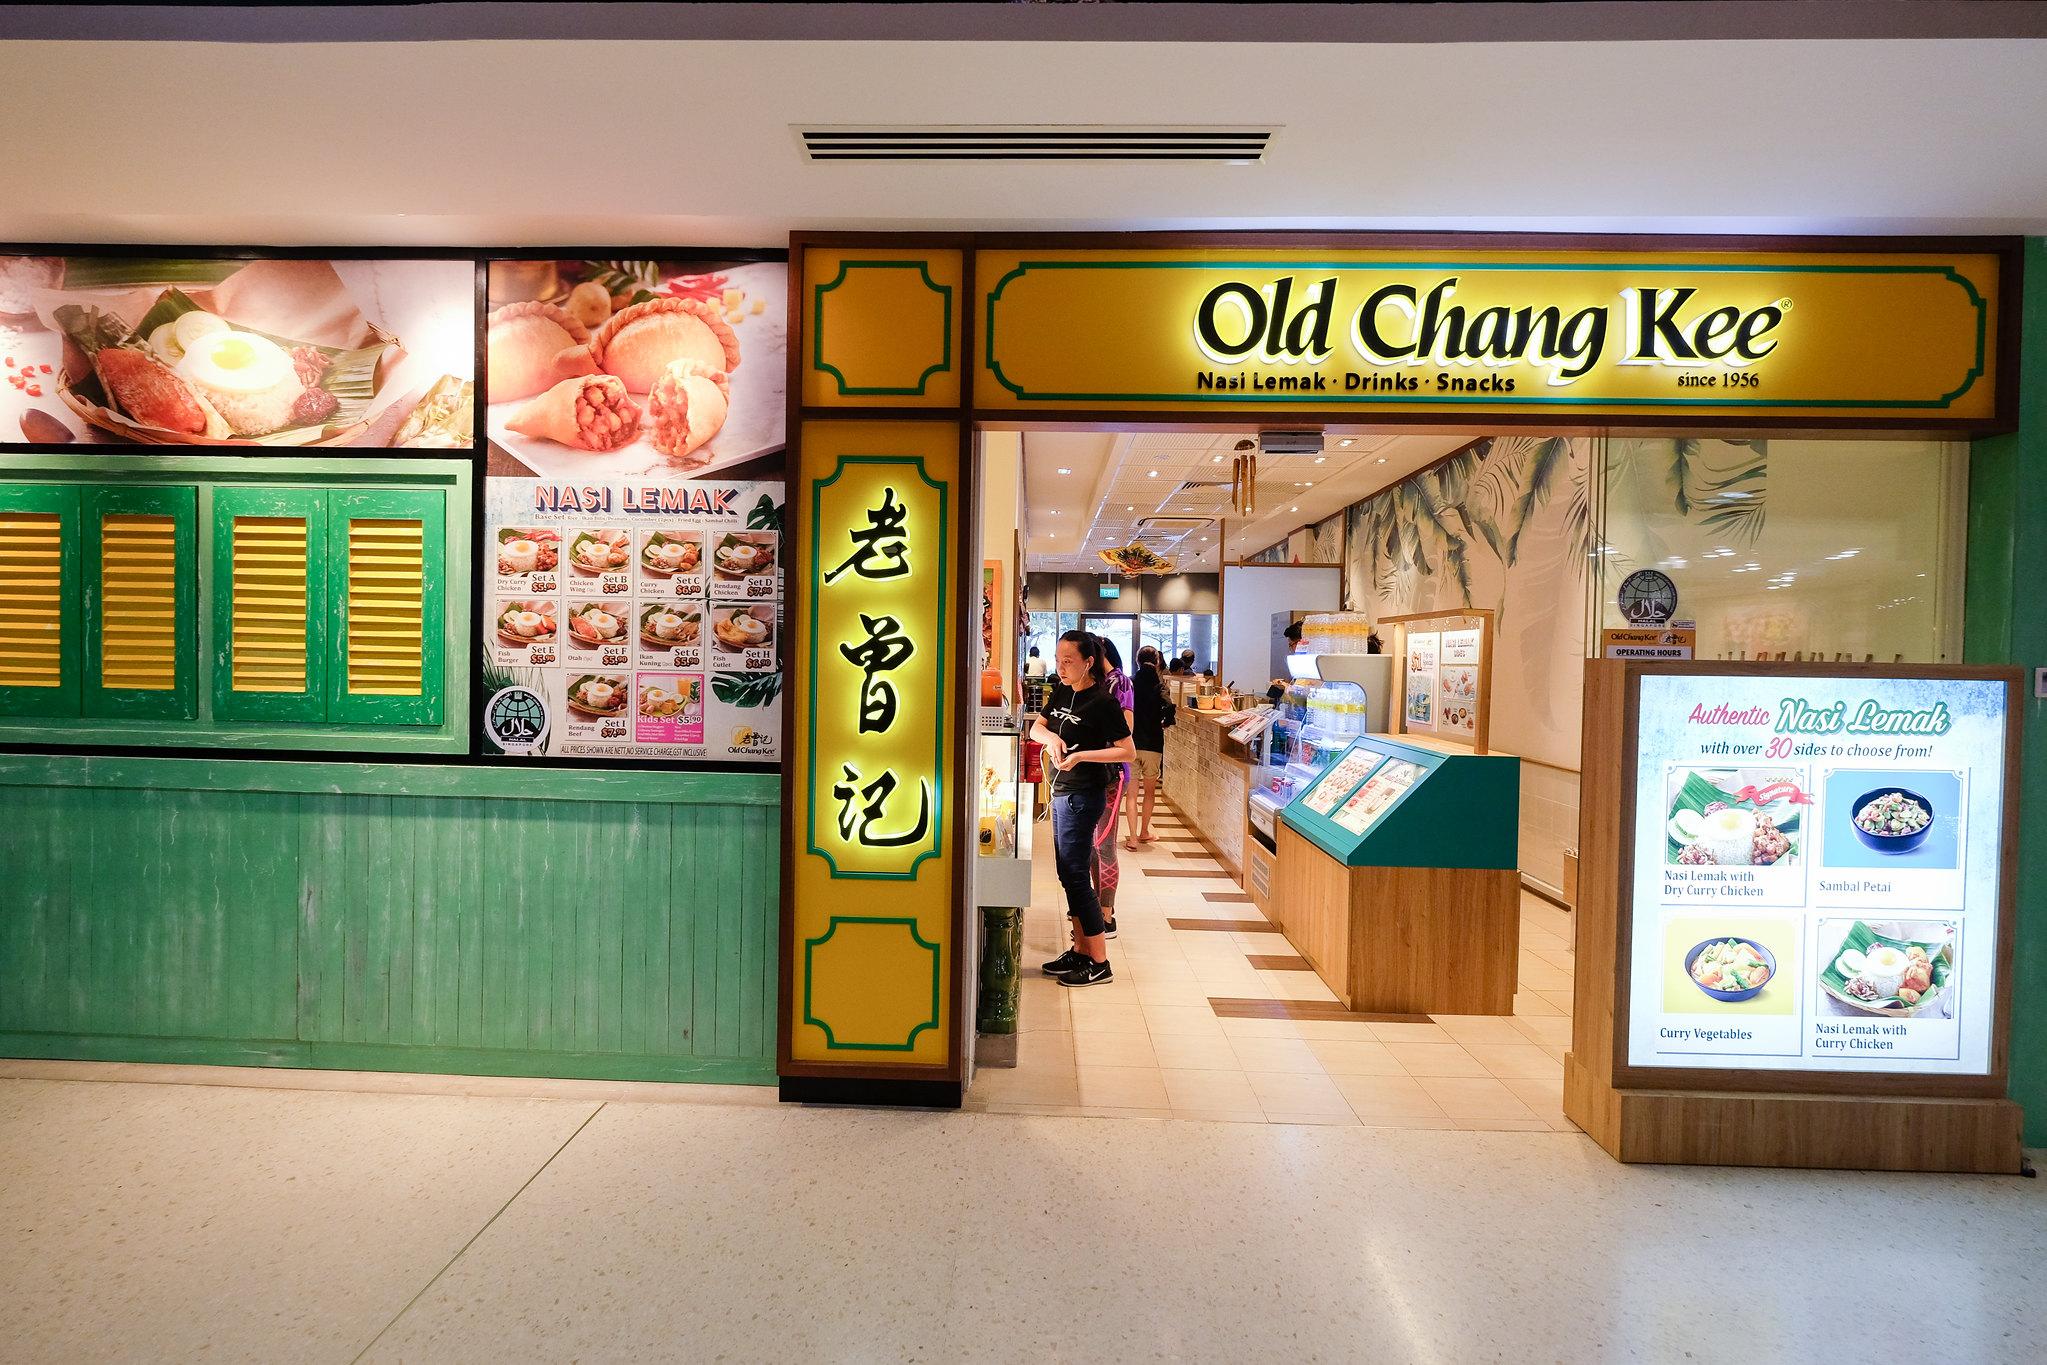 Old Chang Kee DSCF4151-1